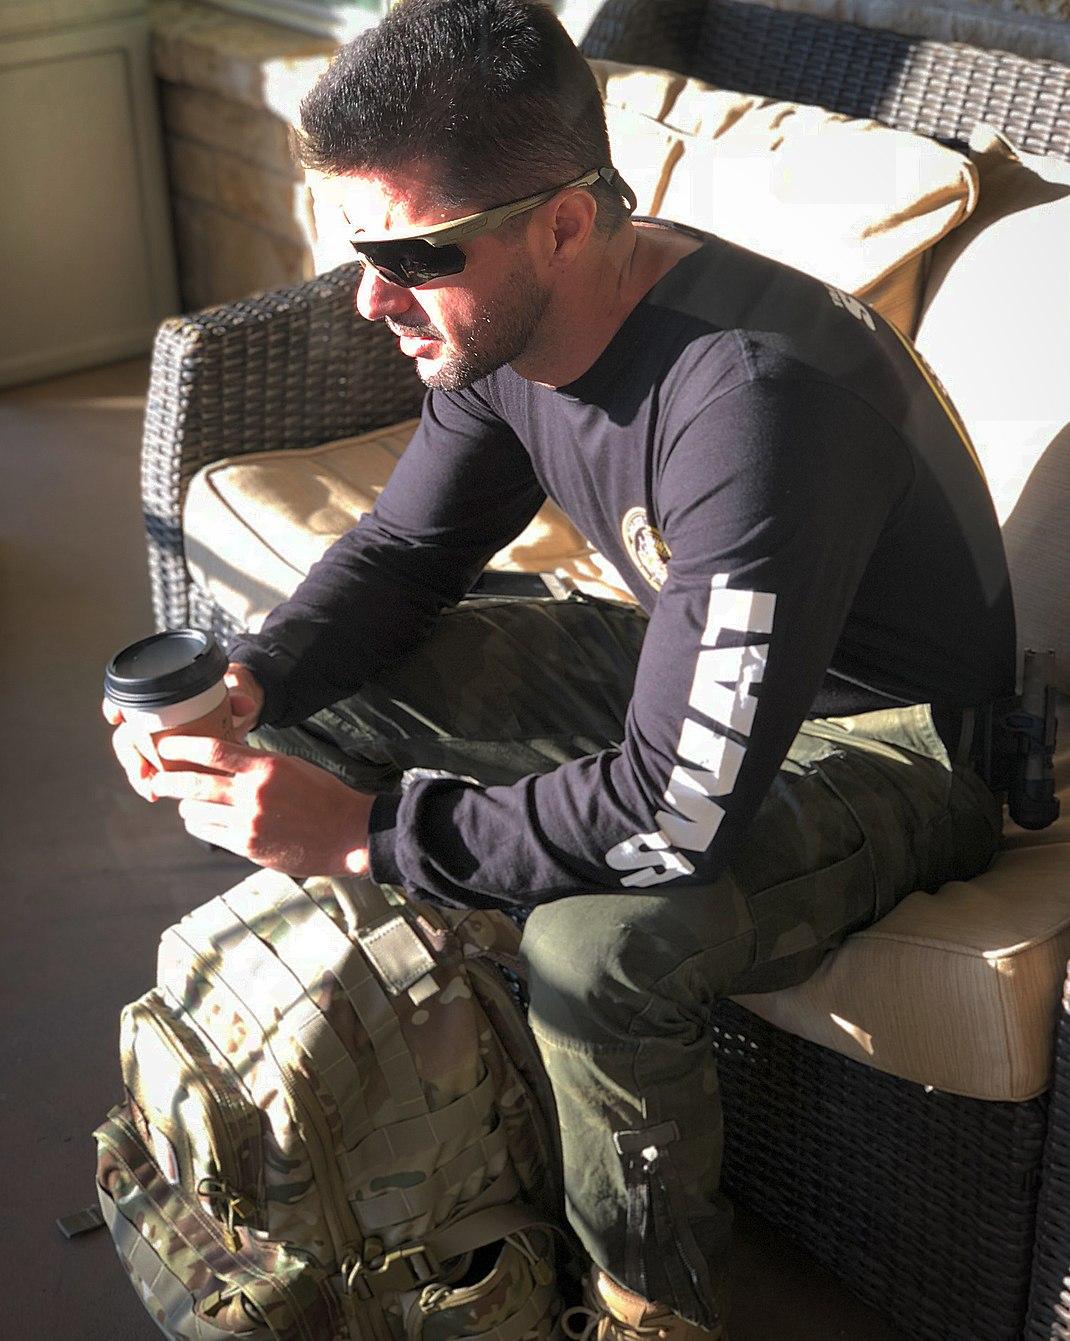 sexy-masculine-daddy-swat-team-member-alpha-male-uniformed-soldier-dilf